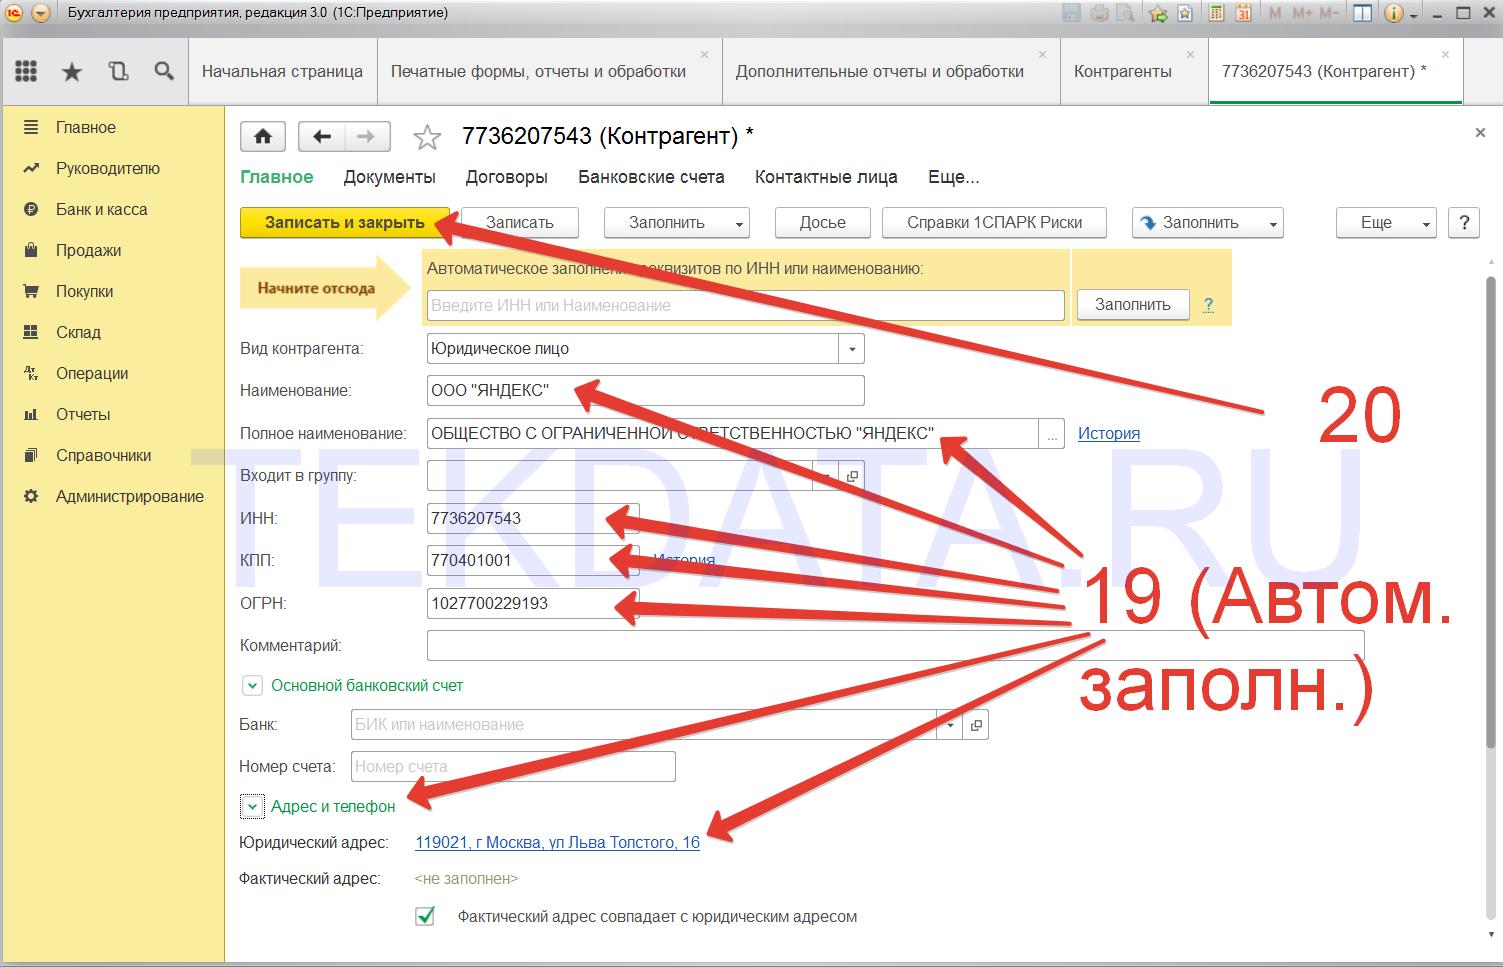 Заполнение контрагентов по ИНН или ОГРН в БП 3.0 (Действия 19-20) | tekdata.ru